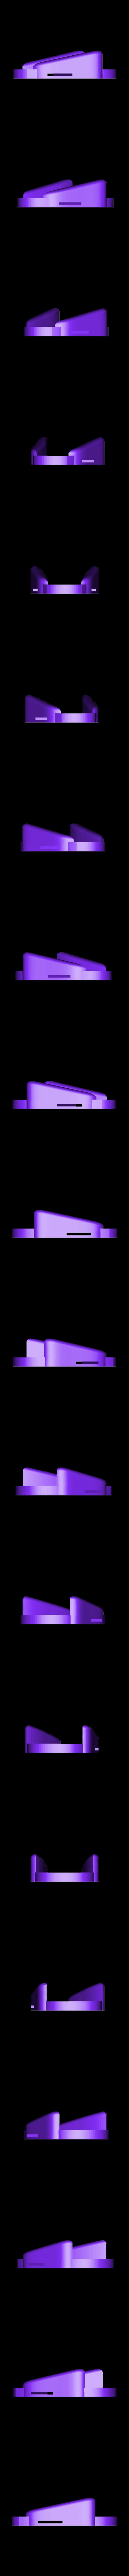 Stamets_dual_2.stl Download free STL file Stammets spore drive implants • 3D print design, poblocki1982